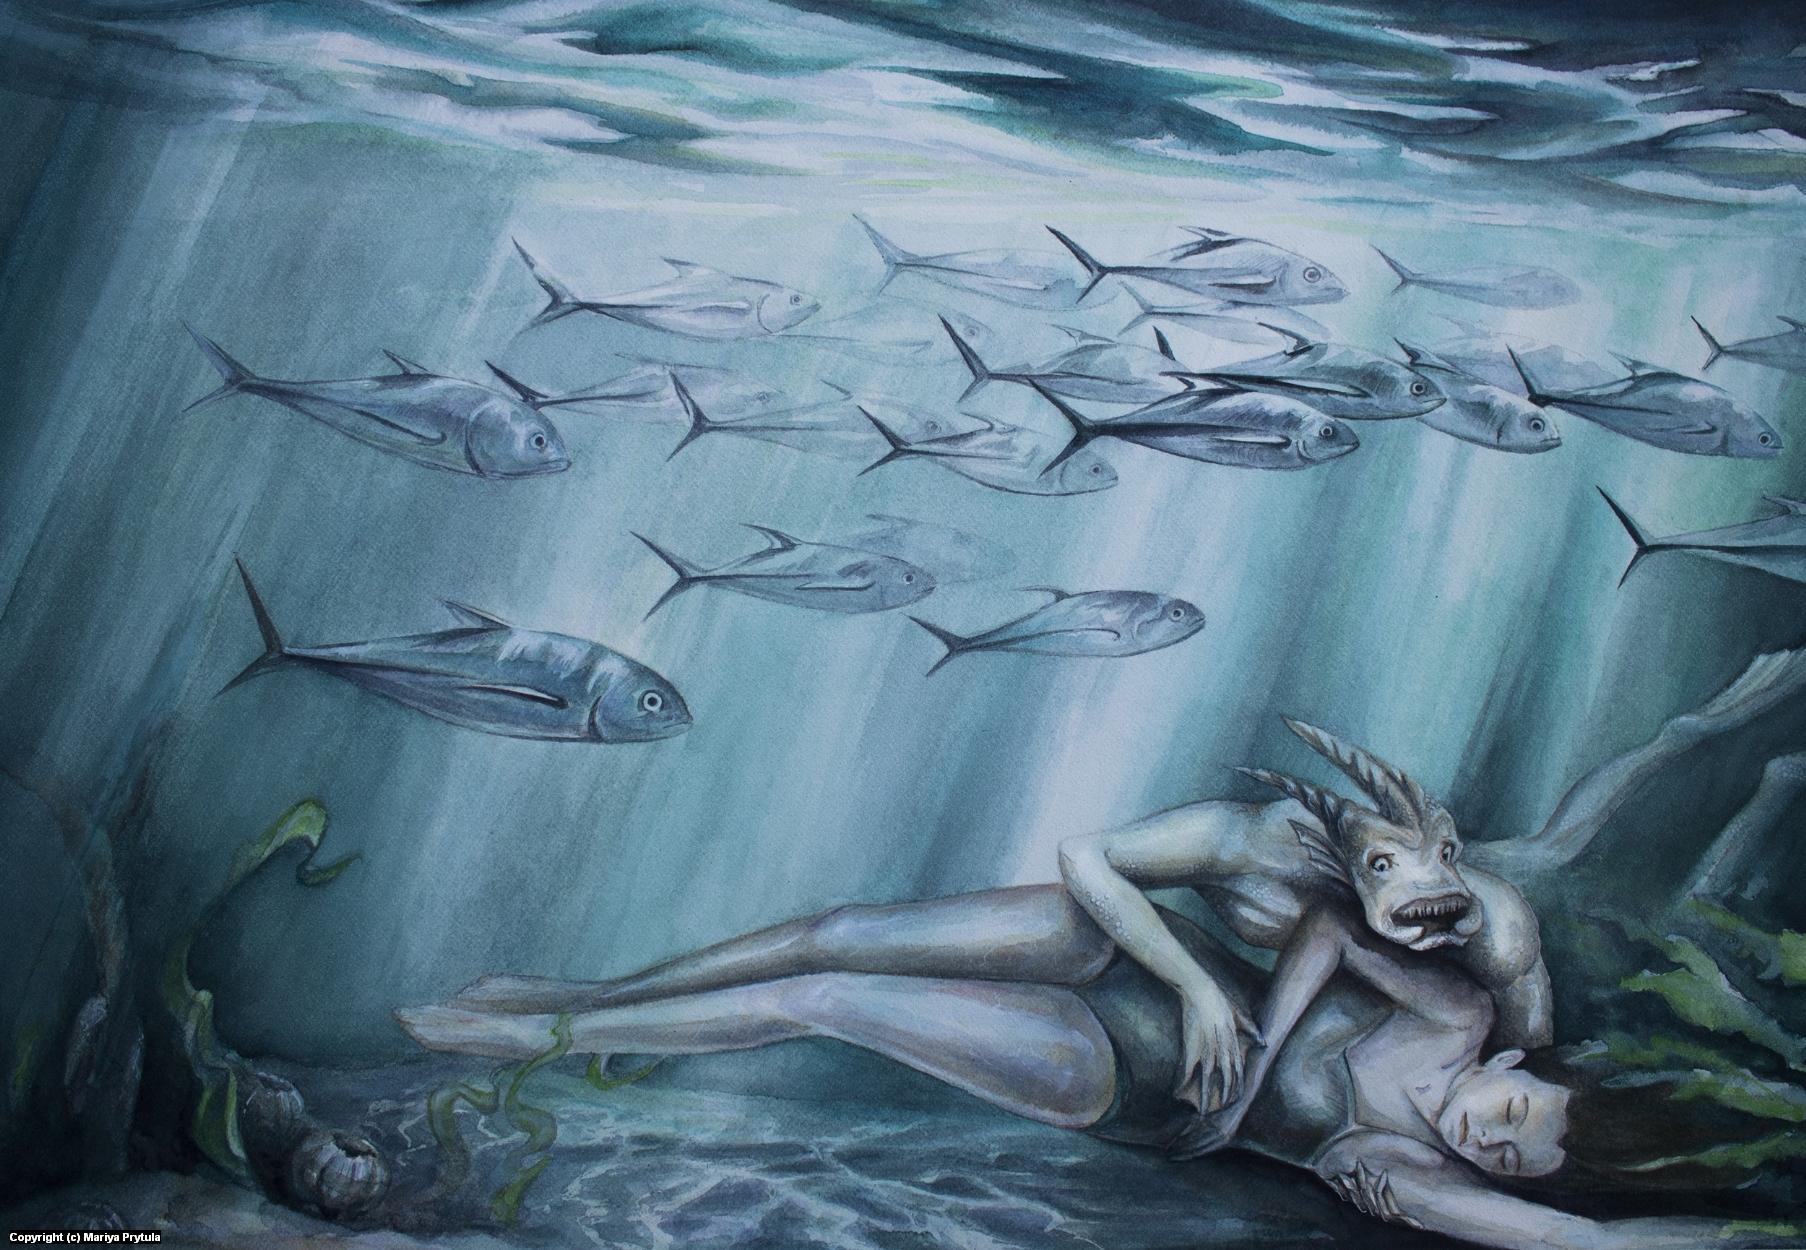 Beauty and the Deep Artwork by Mariya Prytula